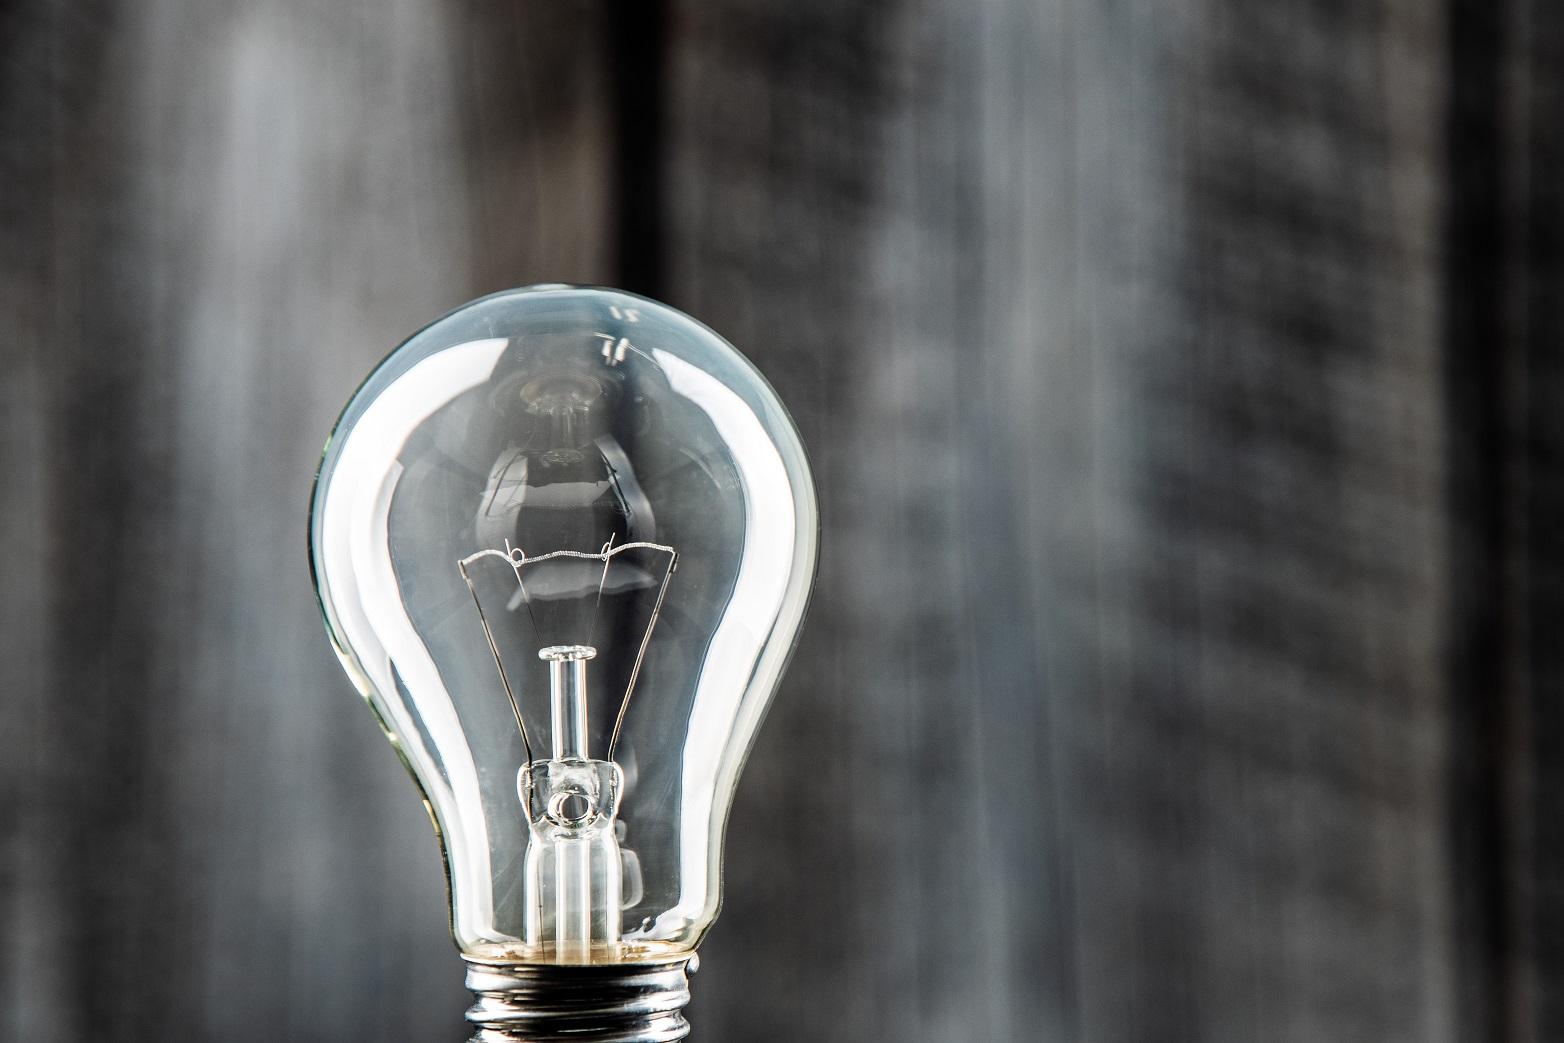 classic light bulb 25ZVUAW #новости featured, Абхазия, Ингури ГЭС, криптовалюта, майнинг, Черноморэнерго, электроэнергия